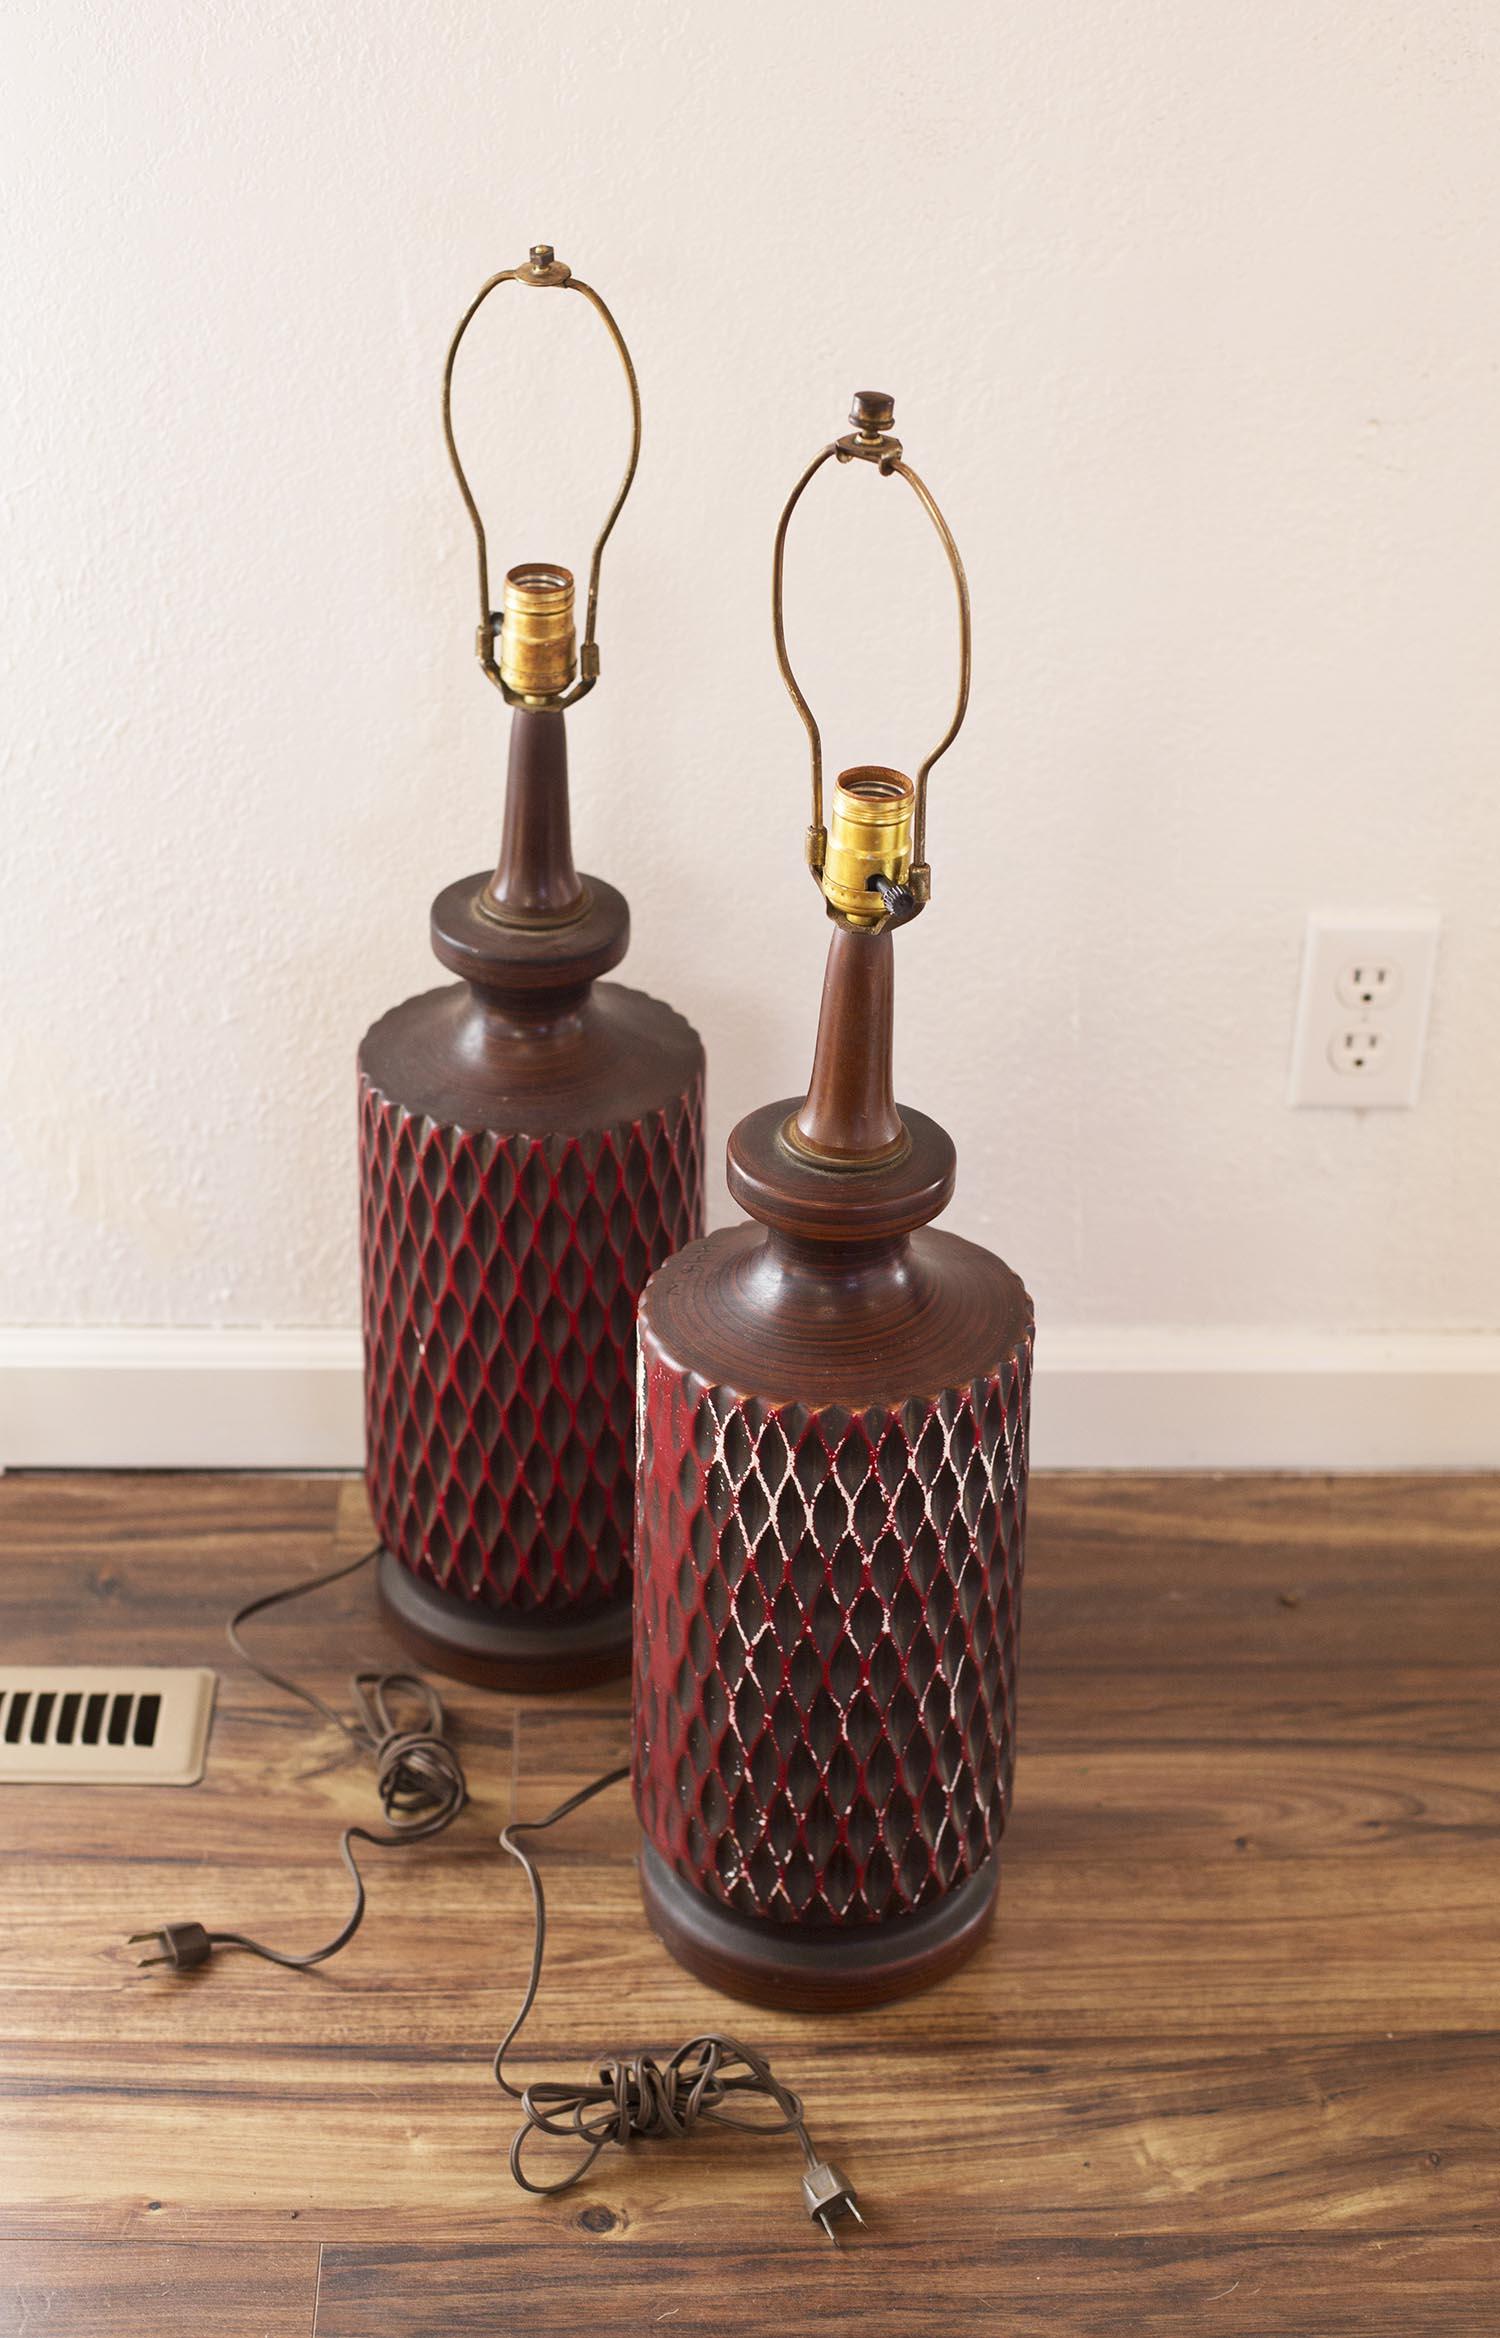 Used lamp pair